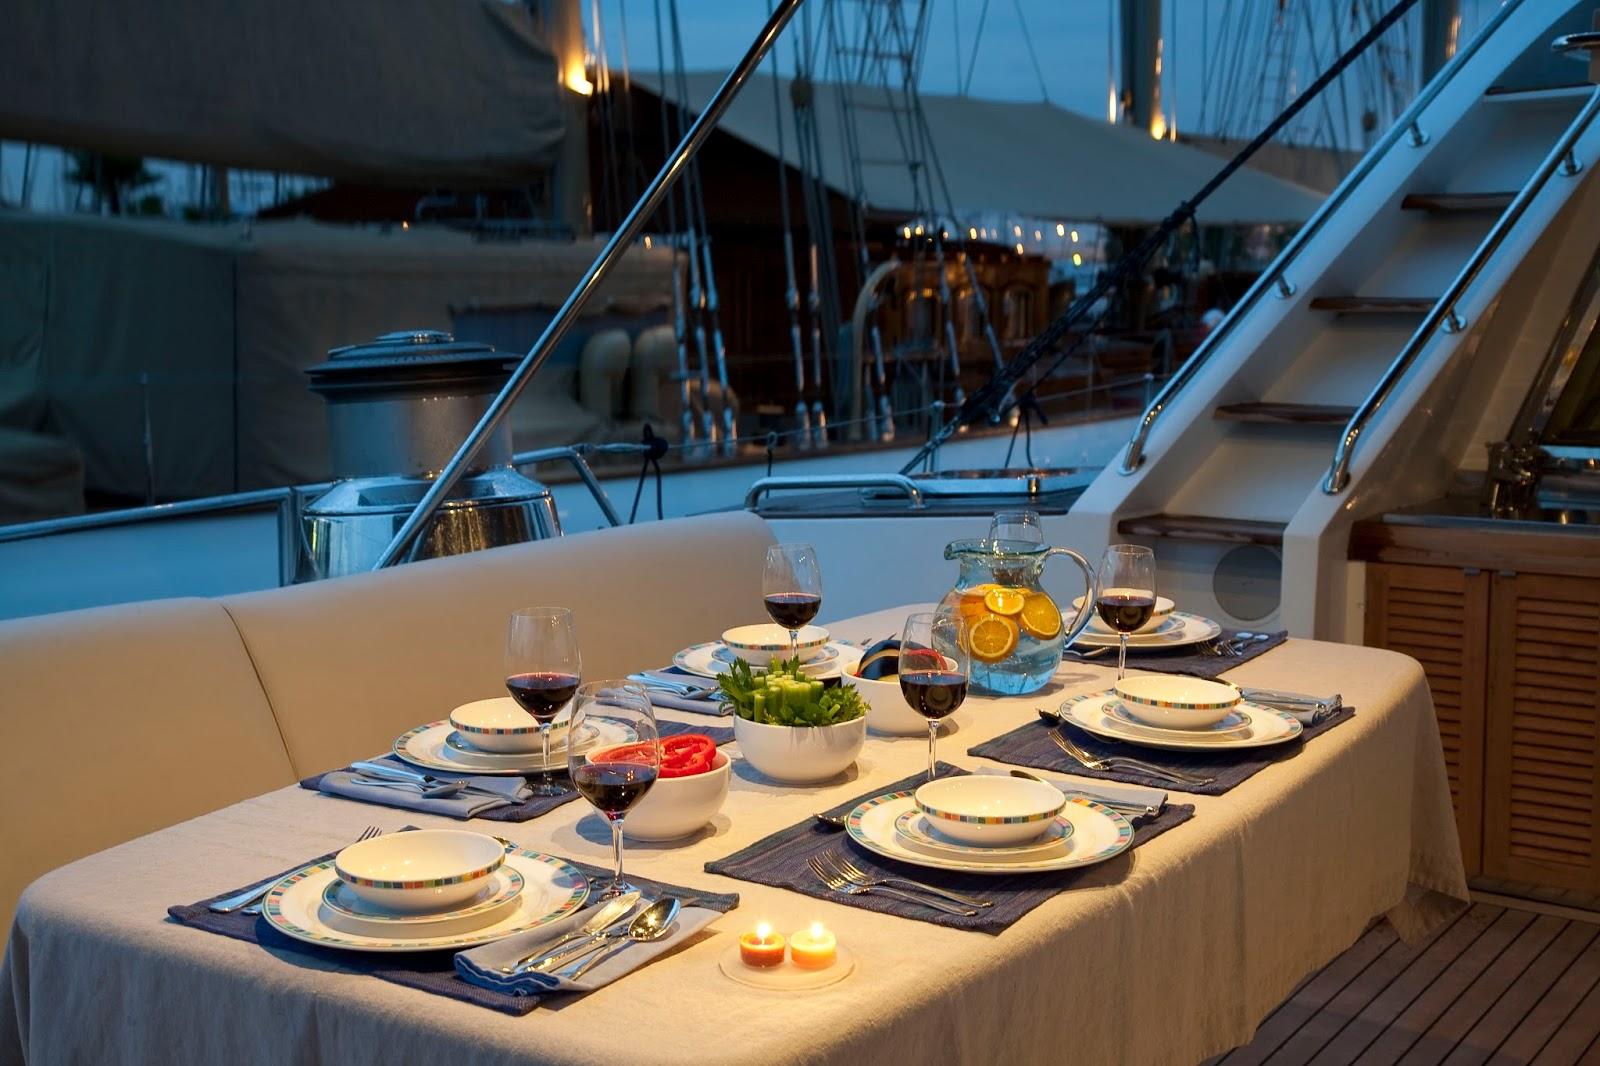 alquiler de veleros en ibiza. alquiler veleros ibiza. alquiler de catamaranes en ibiza. alquiler barcos ibiza. alquilar yates en ibiza. veleros de alquiler en ibiza